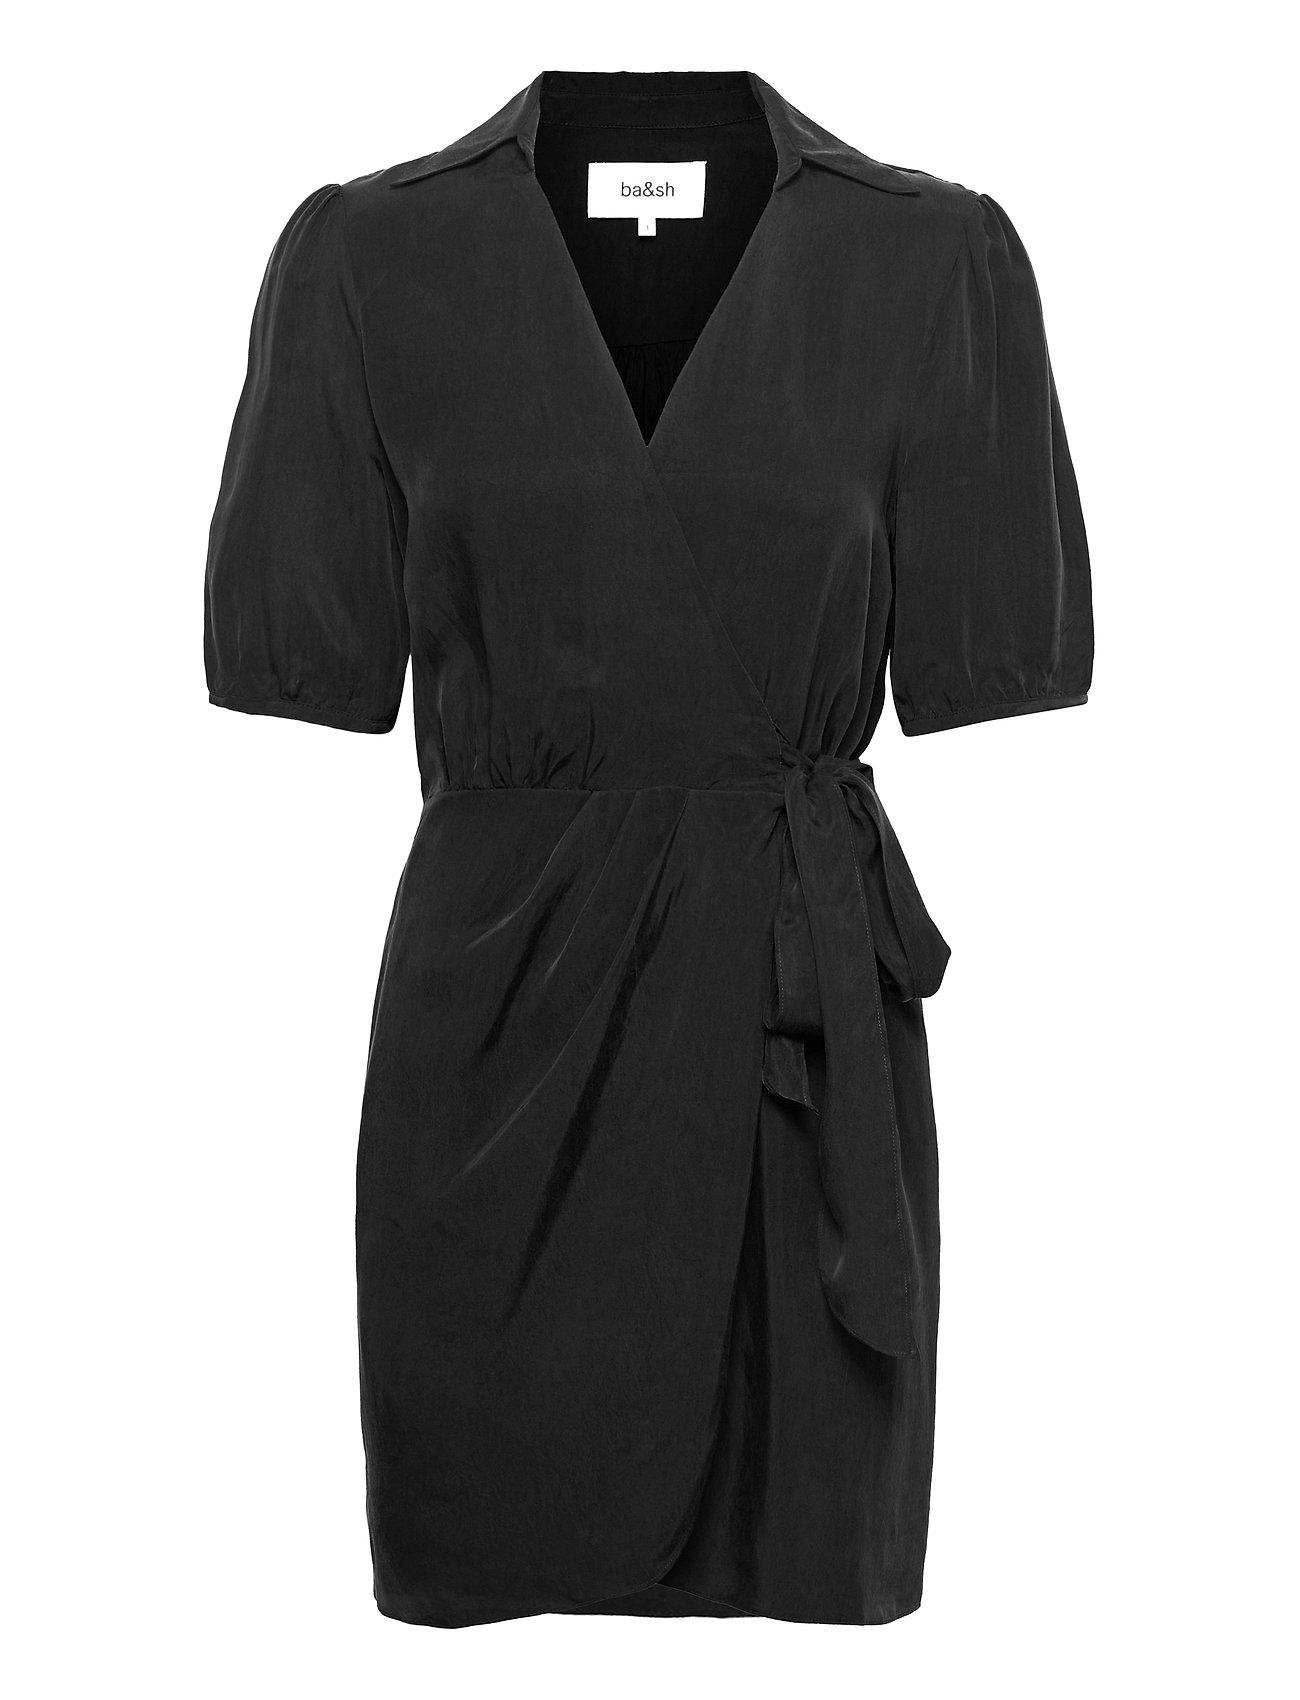 Ada Dress Dresses Cocktail Dresses Sort Ba&sh